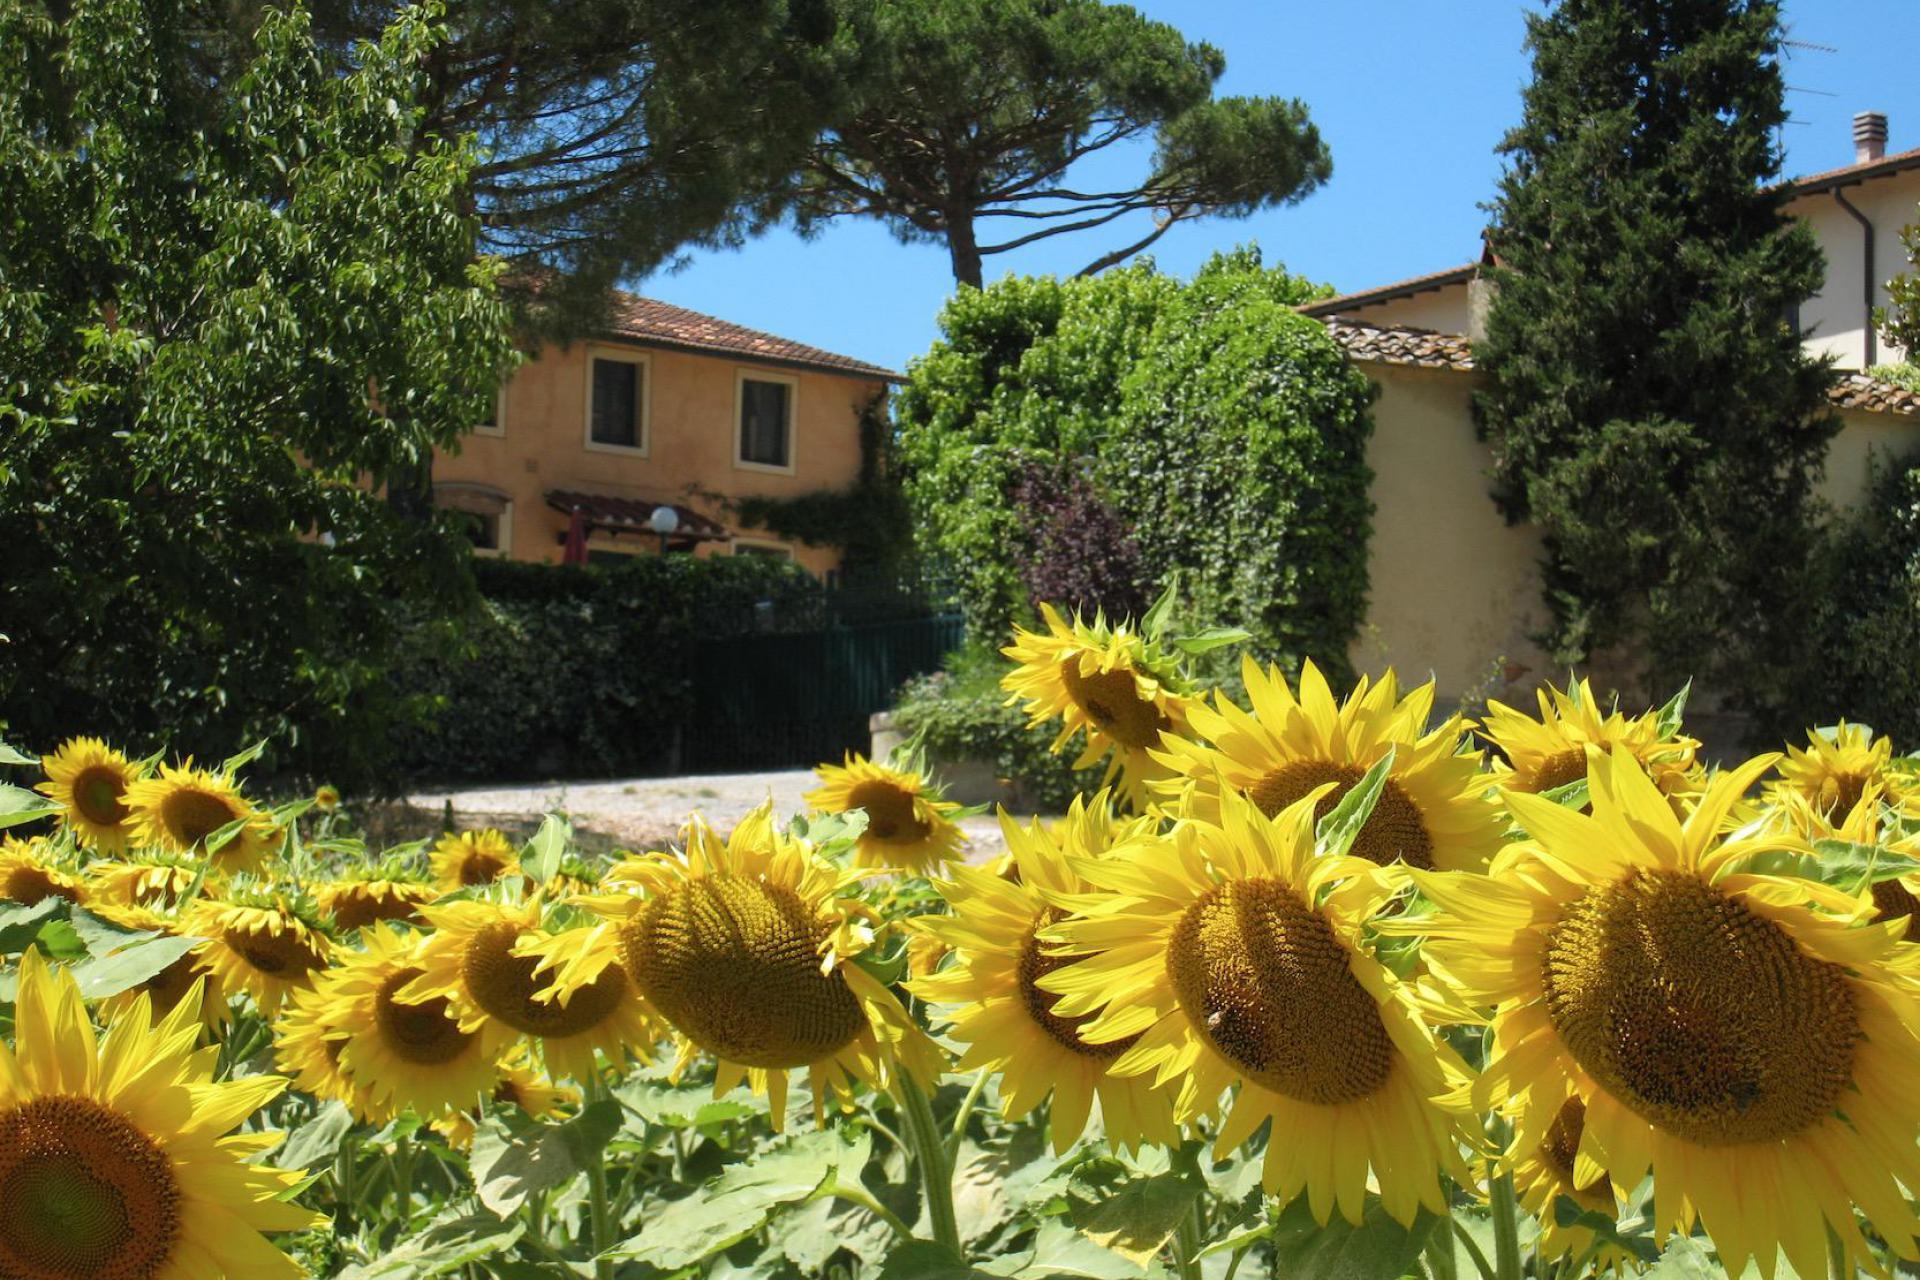 Agriturismo Toscana Agriturismo per famiglie con grande piscina e piscina per bambini